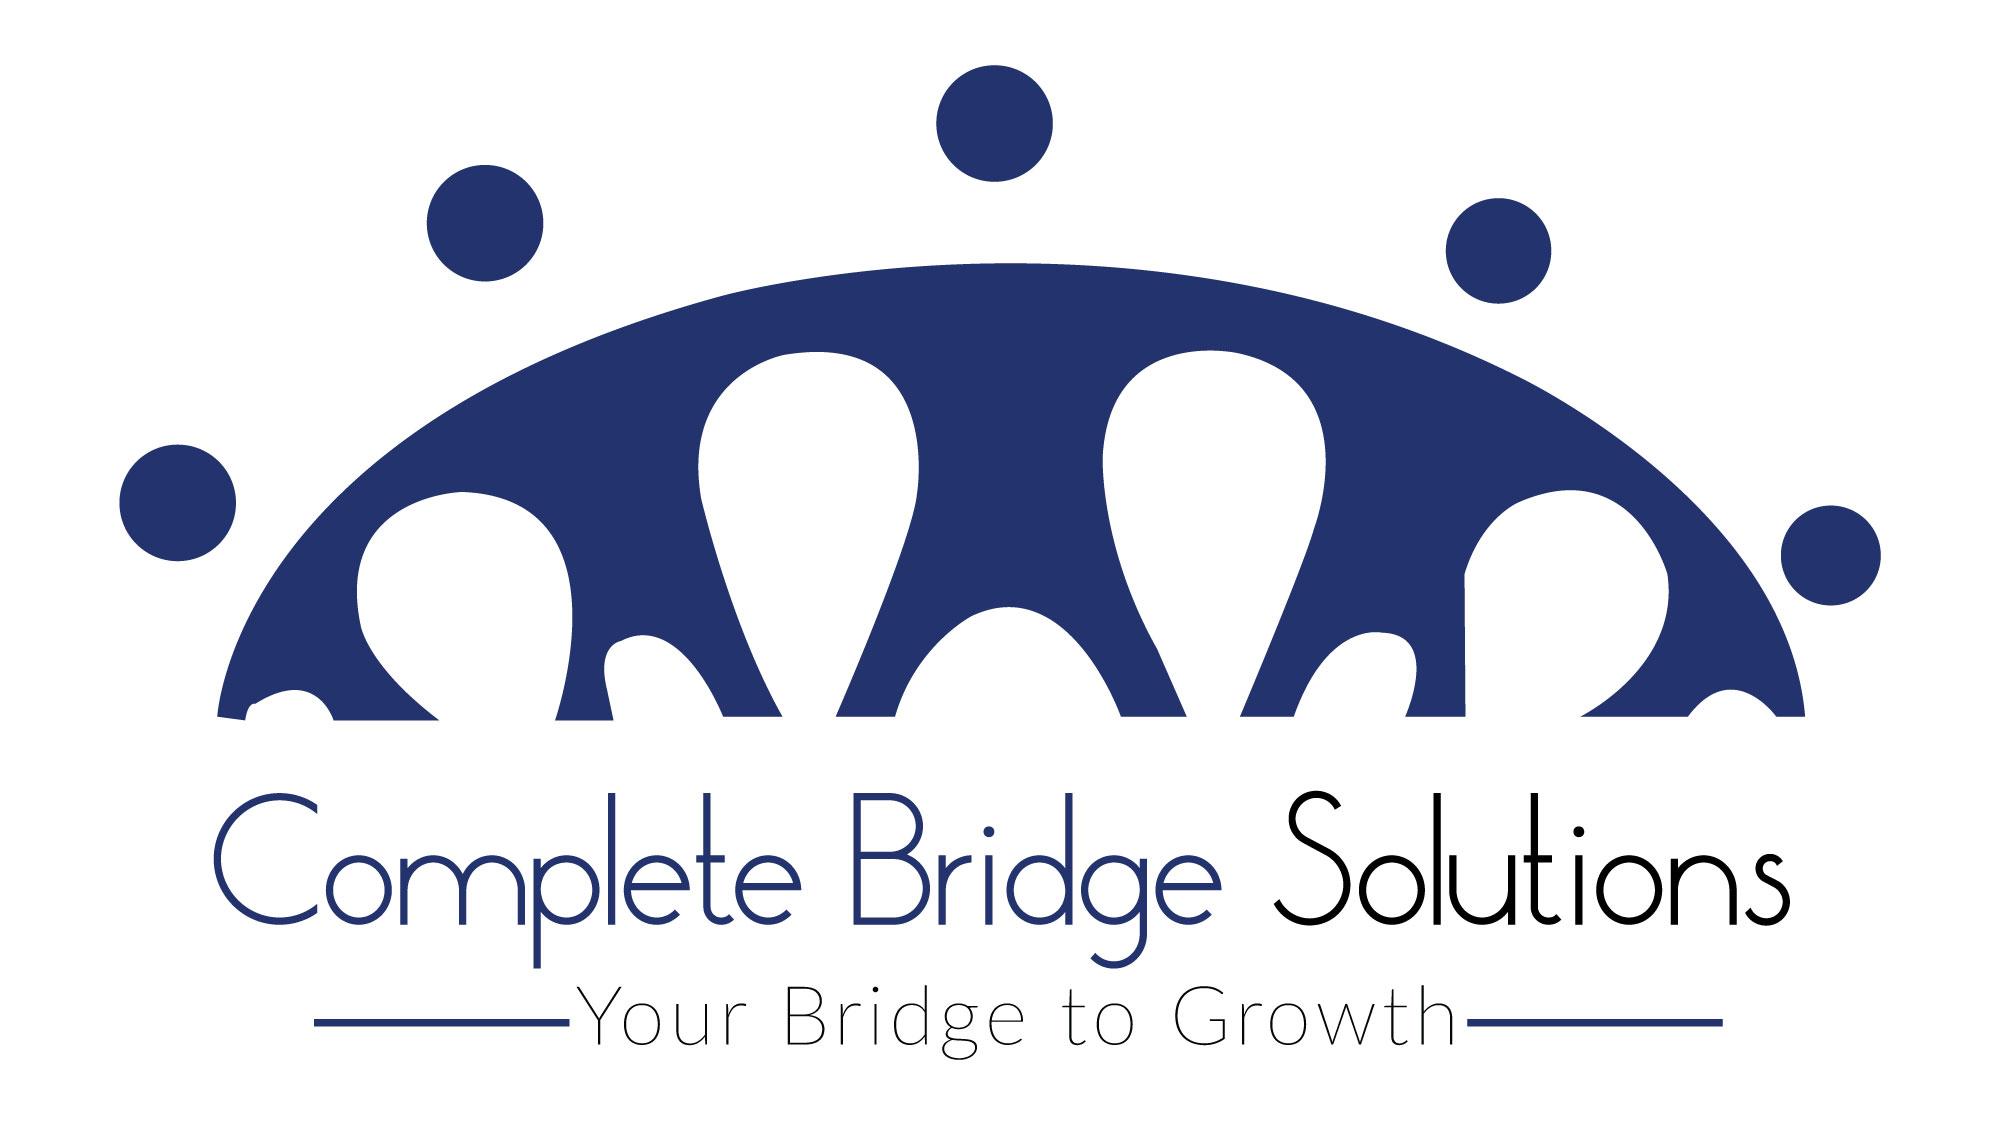 complete-bridge-solutions